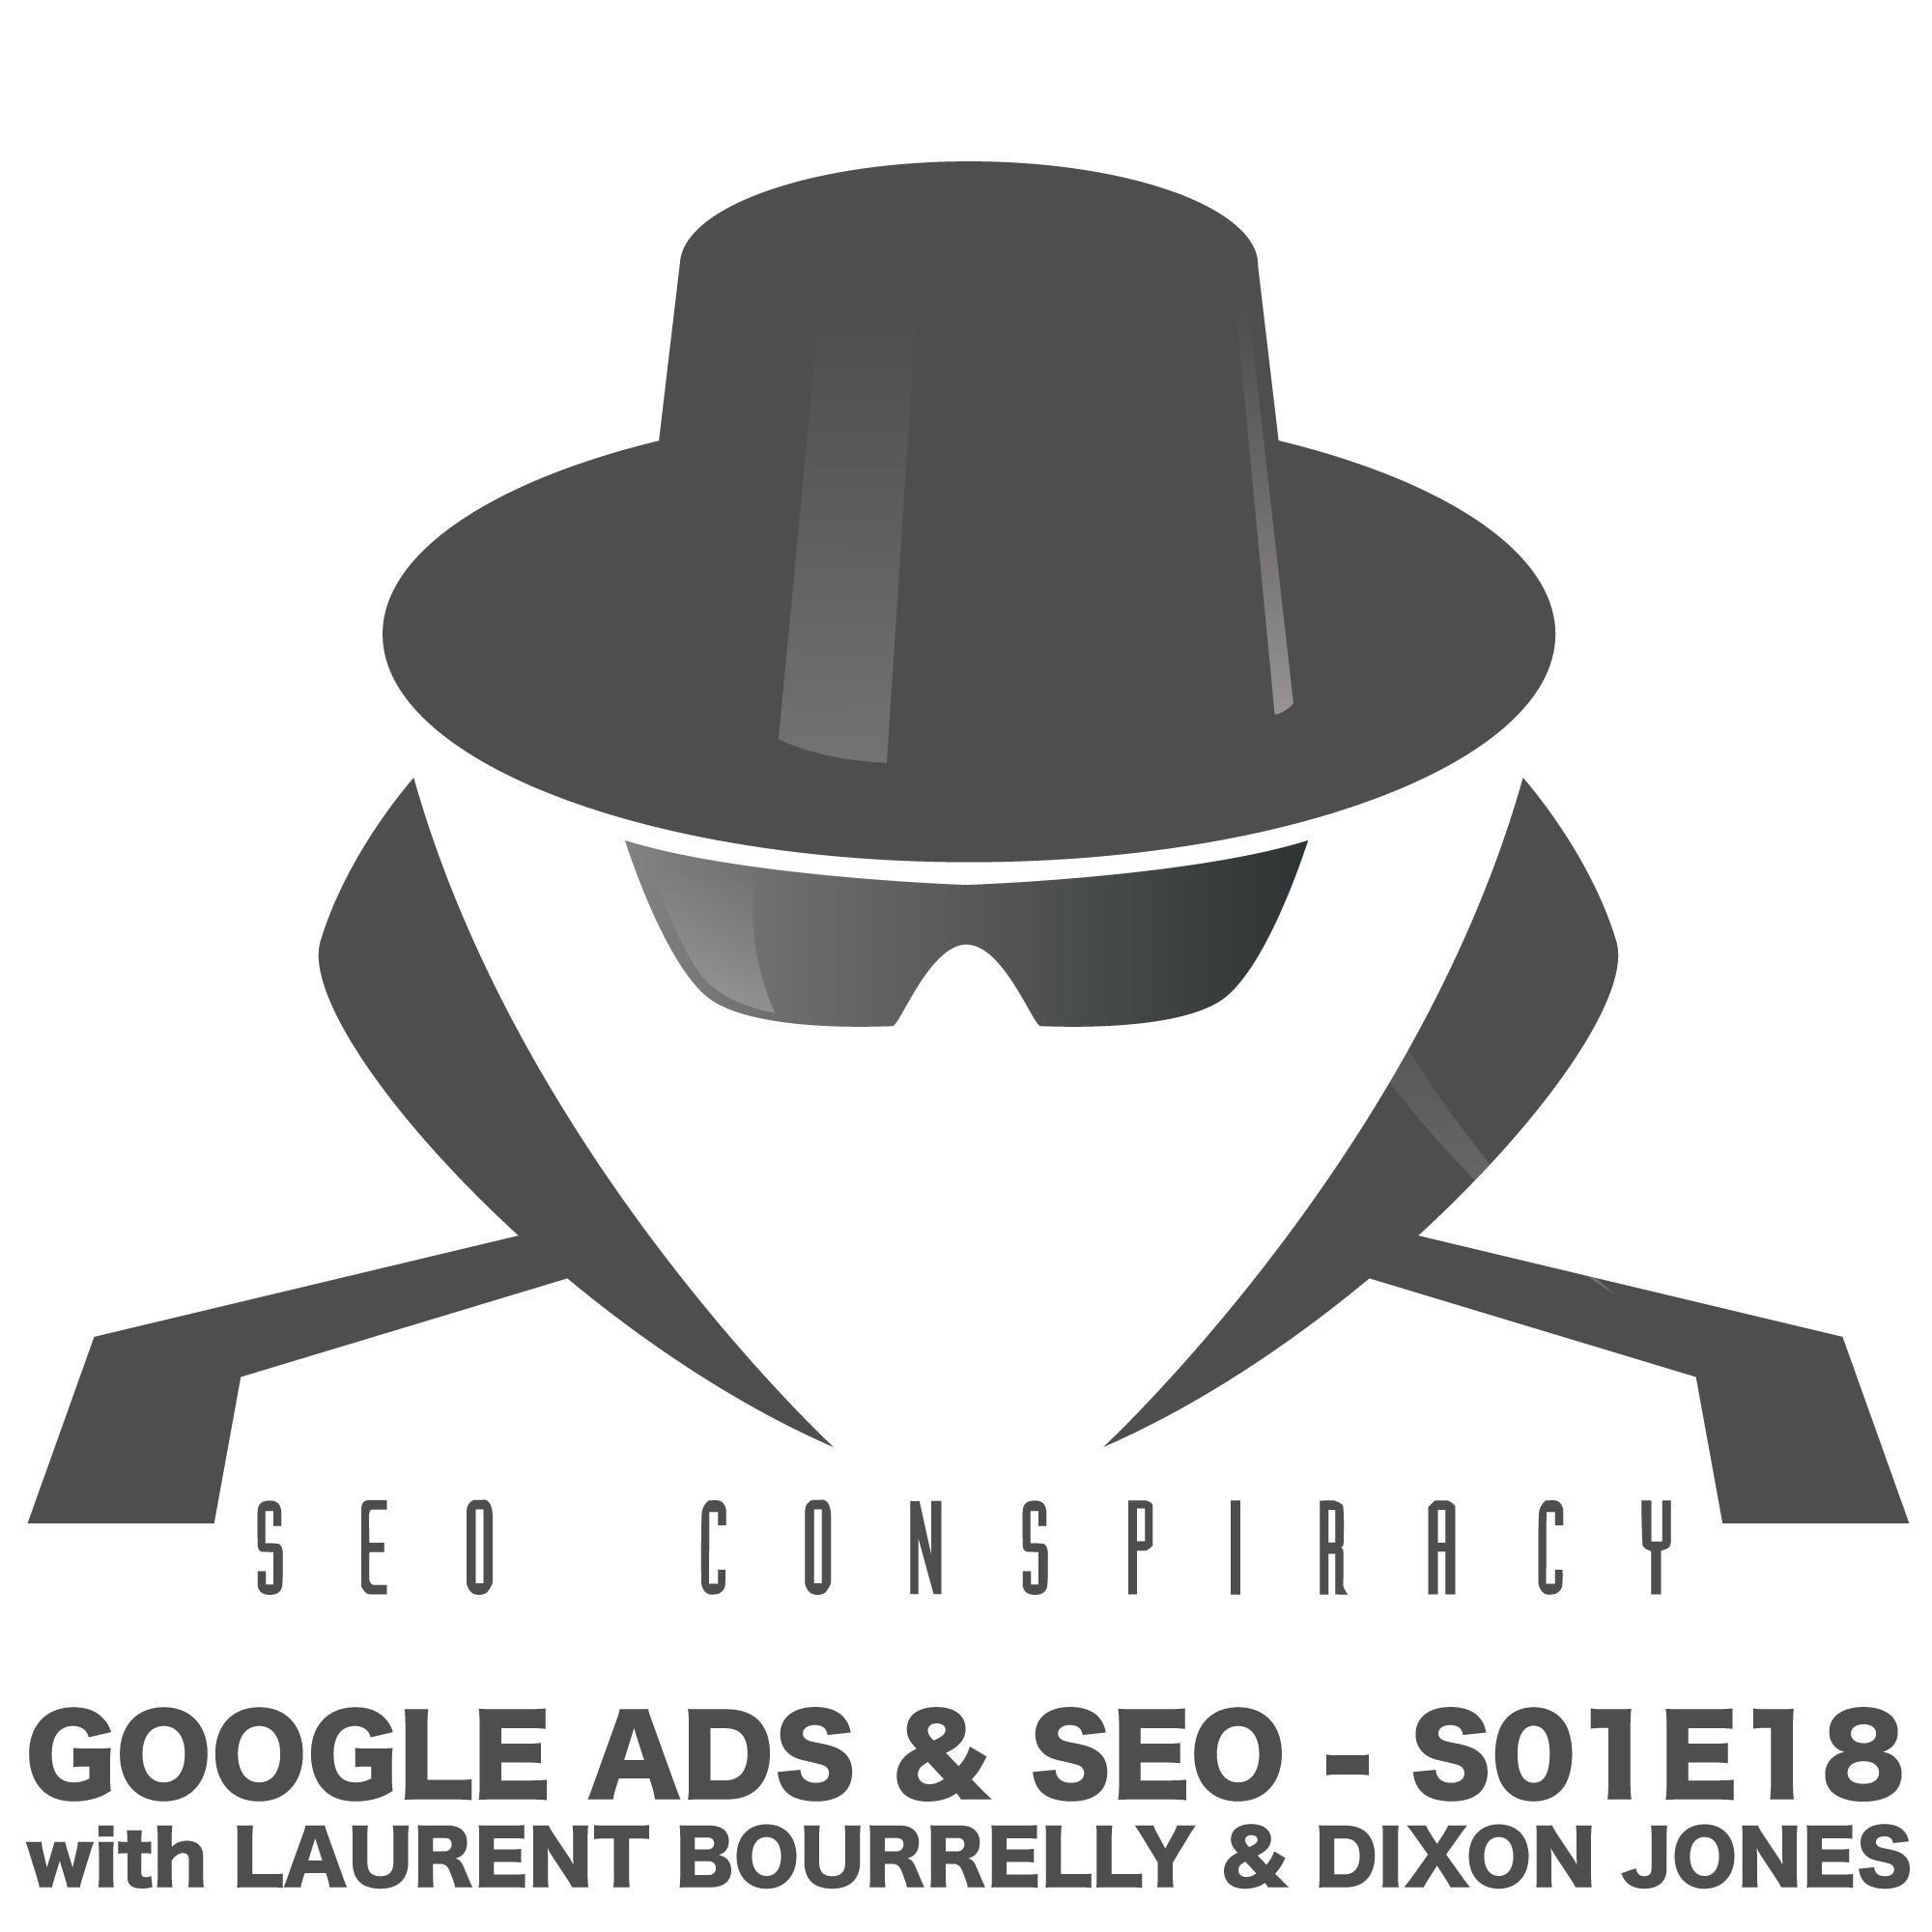 IS GOOGLE ADS A.K.A ADWORDS A RANKING FACTOR FOR GOOGLE SEO? - SEO Conspiracy S01E18